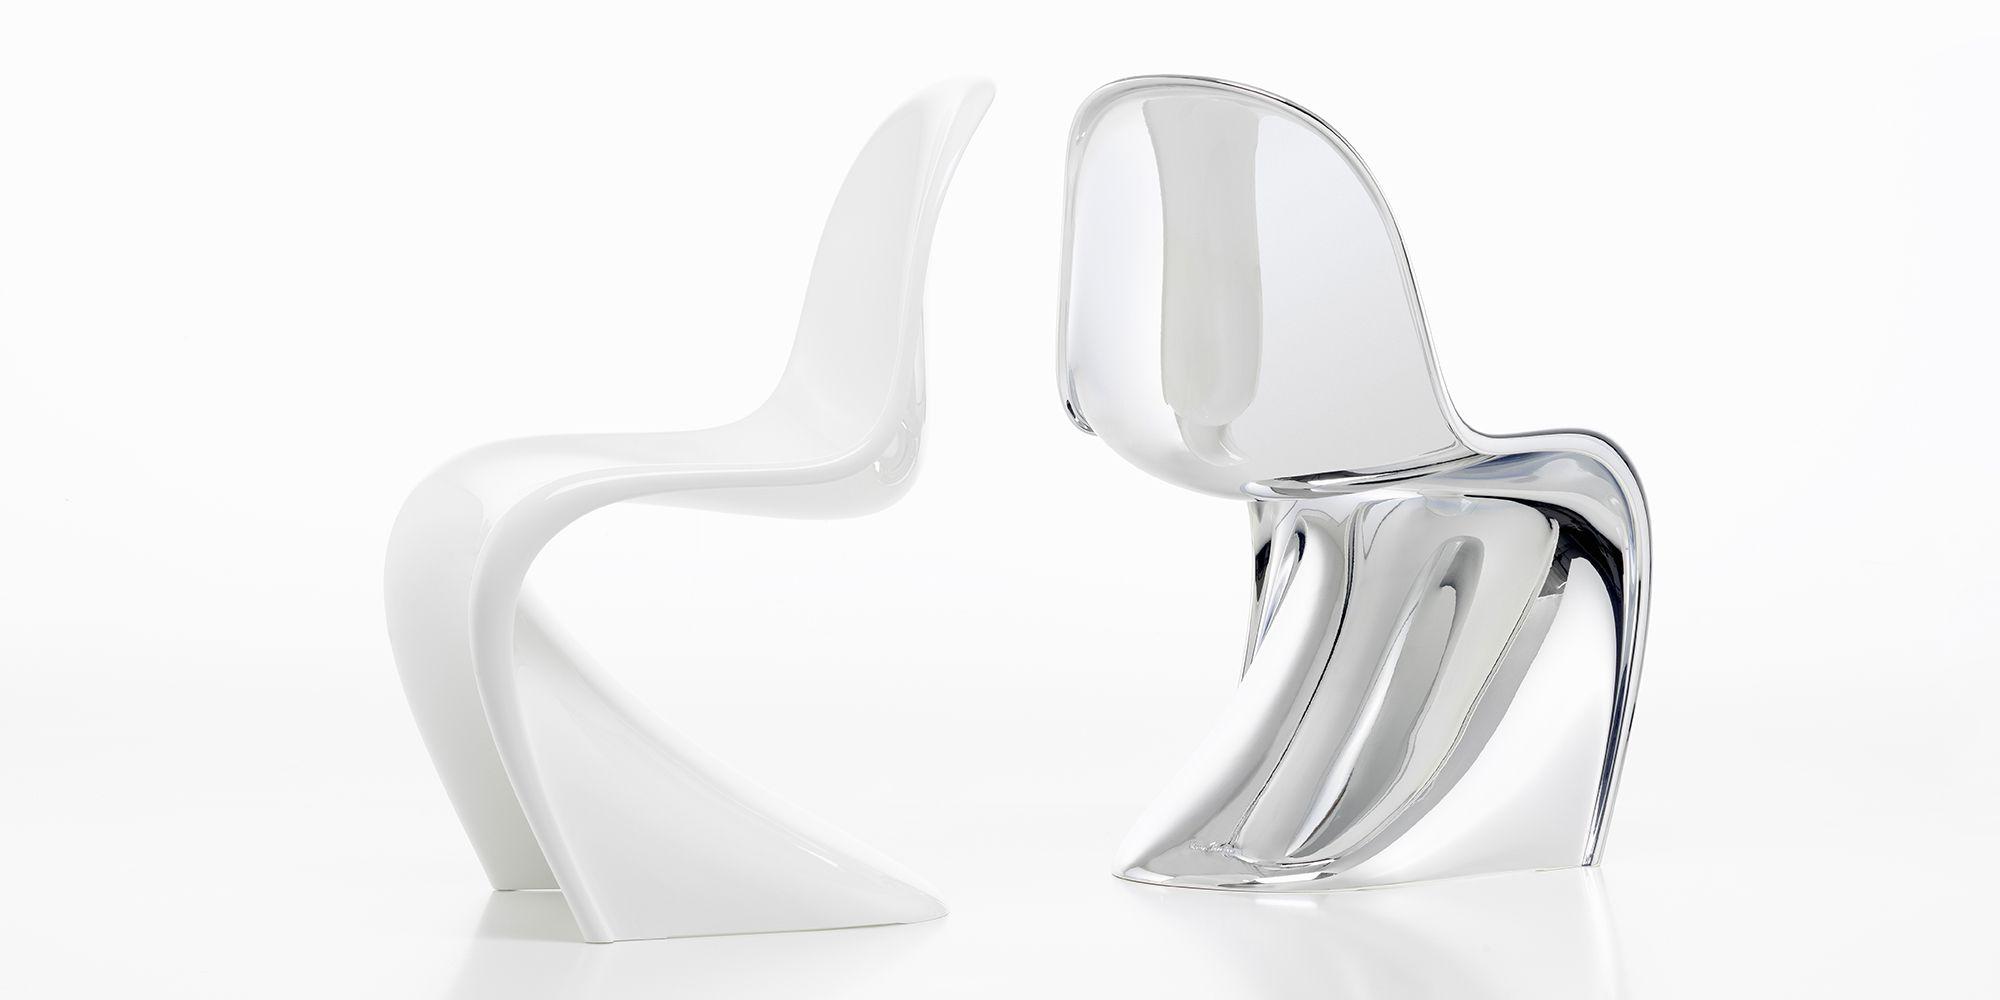 Sedia panton chair vitra